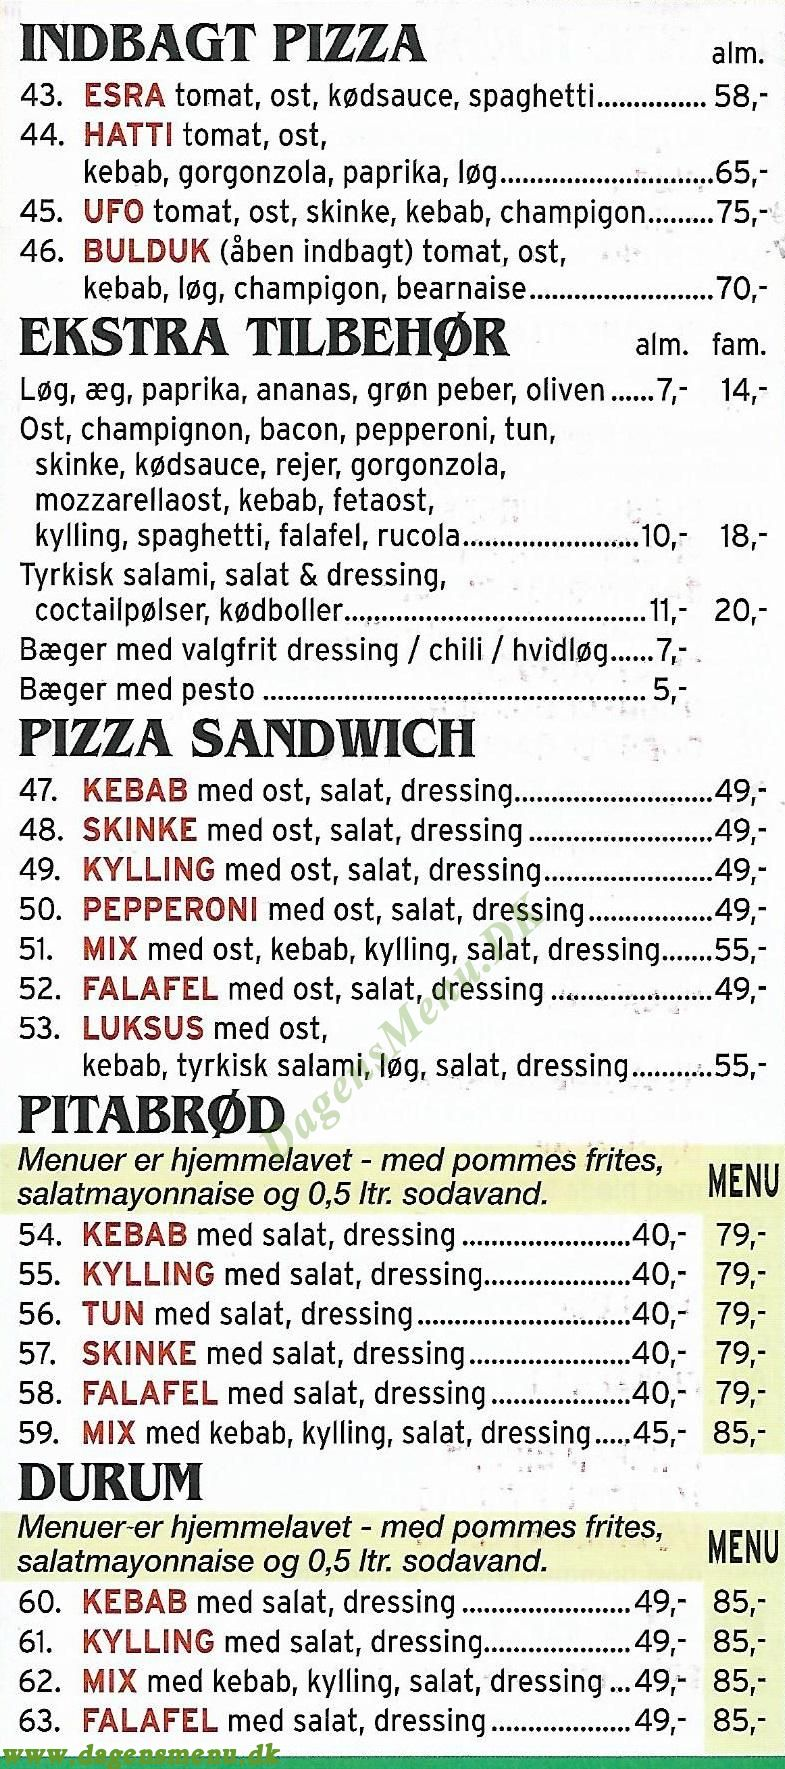 Sct Hans Gade Pizzaria - Menukort